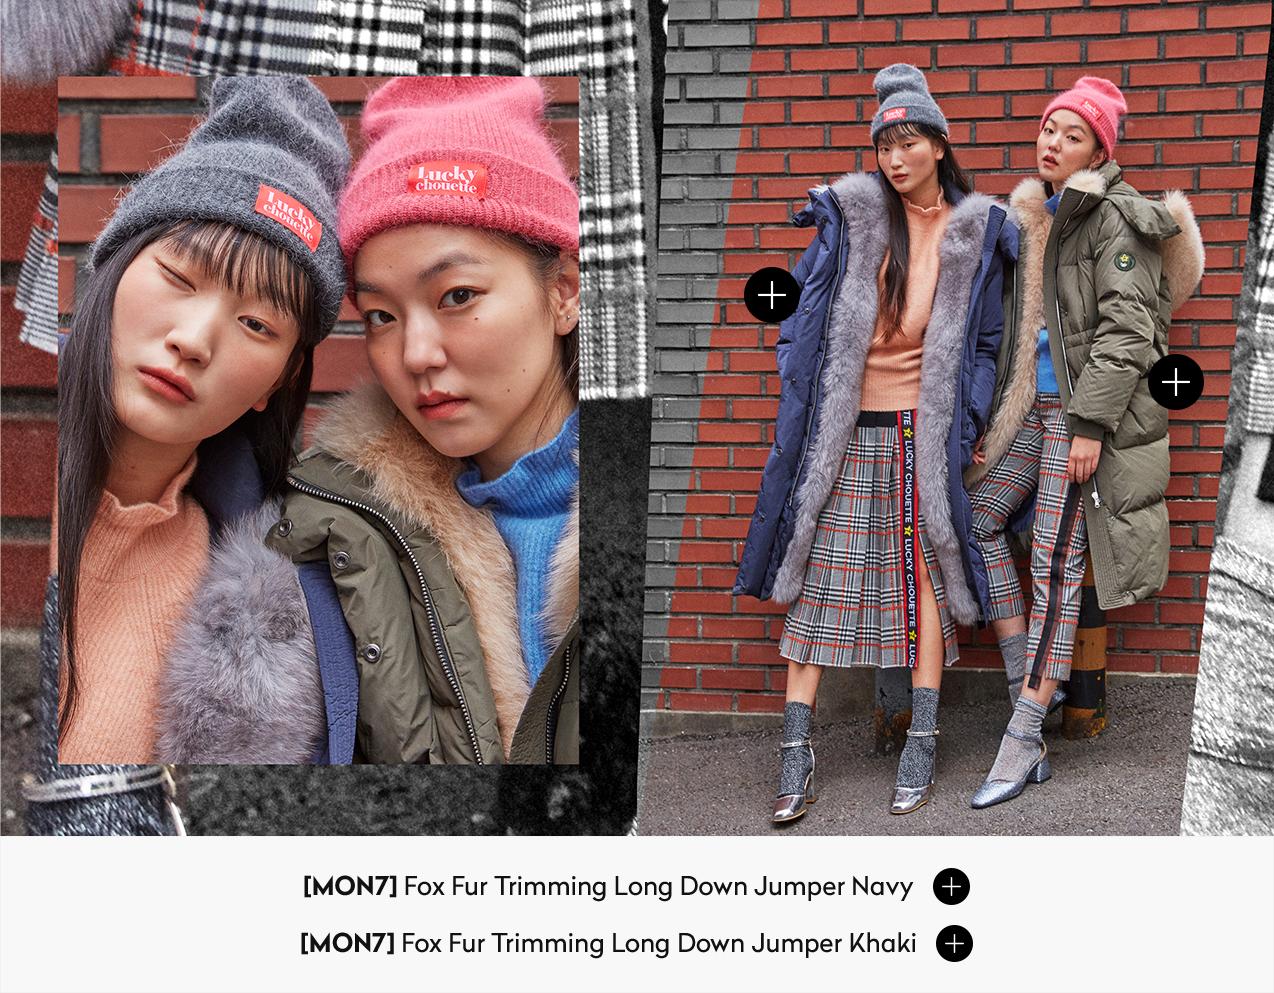 [MON7] Fox Fur Trimming Long Down Jumper Navy & [MON7] Fox Fur Trimming Long Down Jumper Khaki